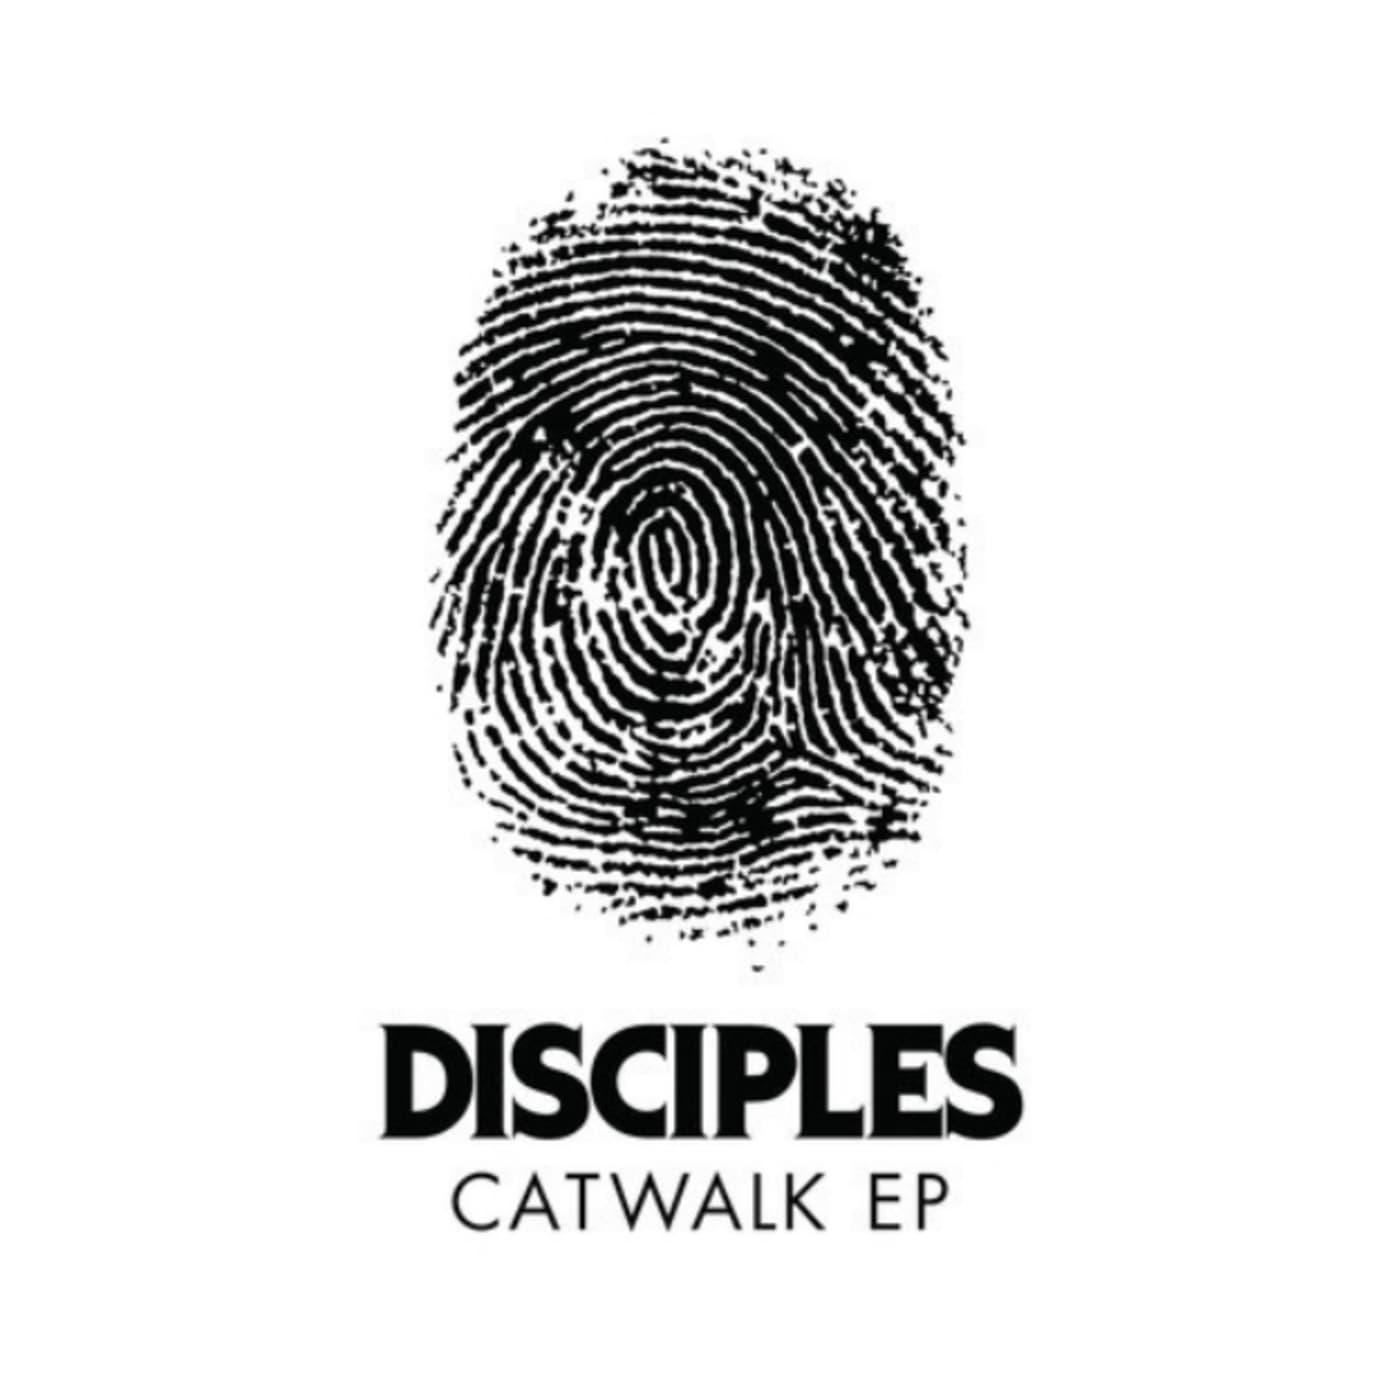 disciples catwalk ep